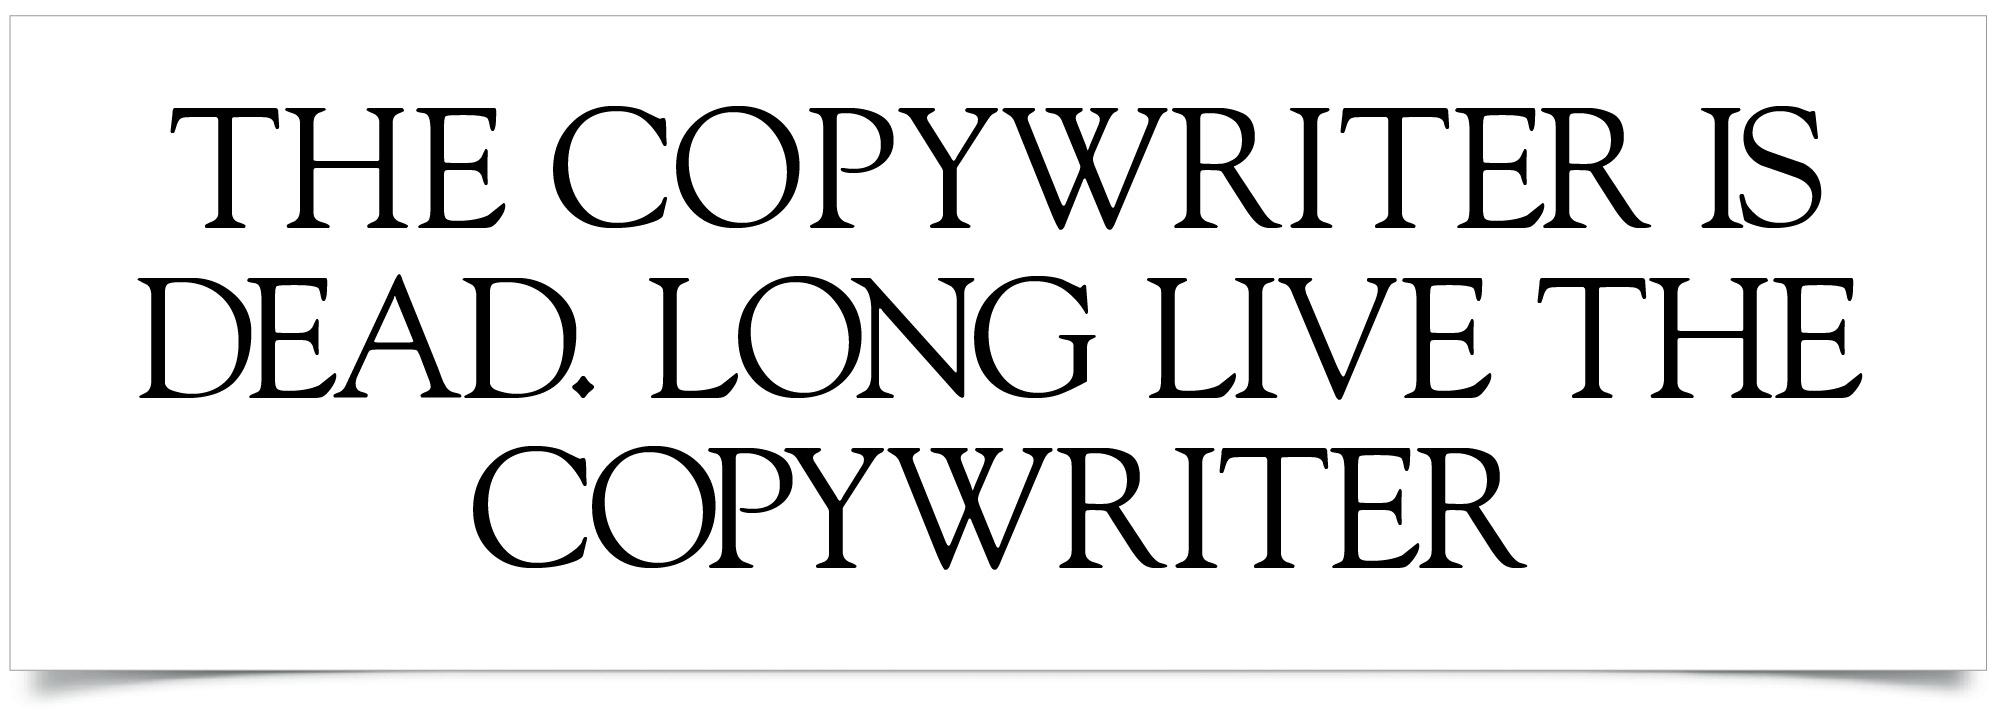 The Copywriter is dead-07.jpg